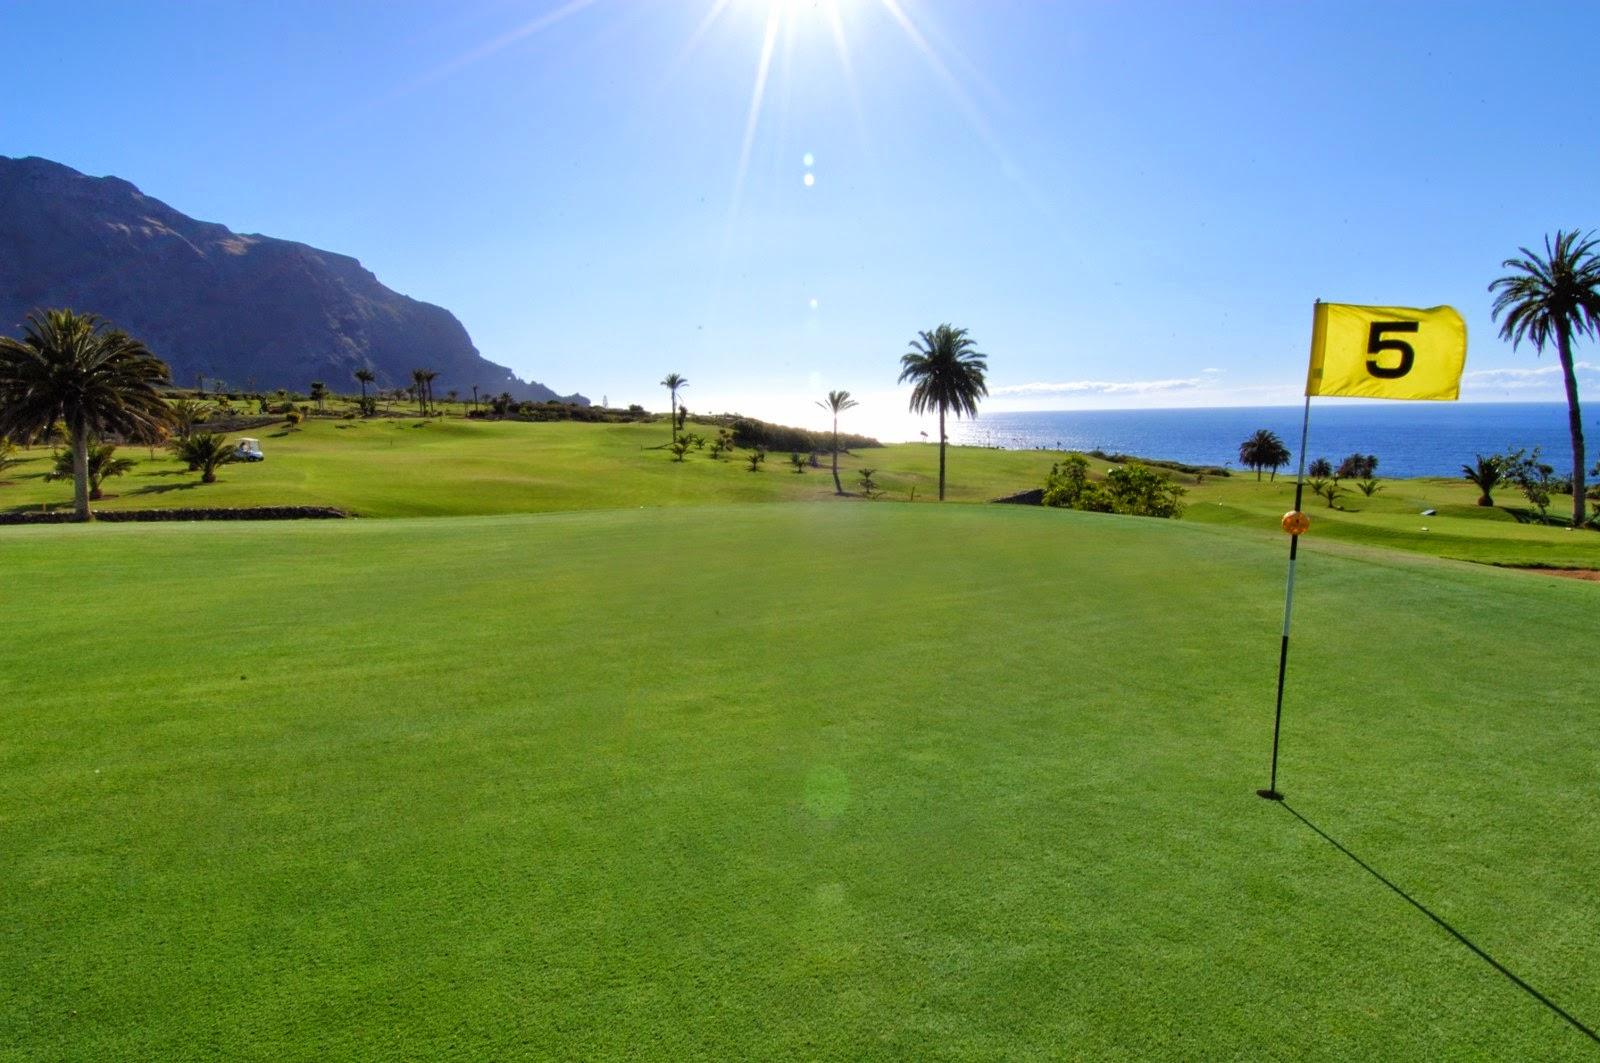 Buenavista Golf, North East Tenerife